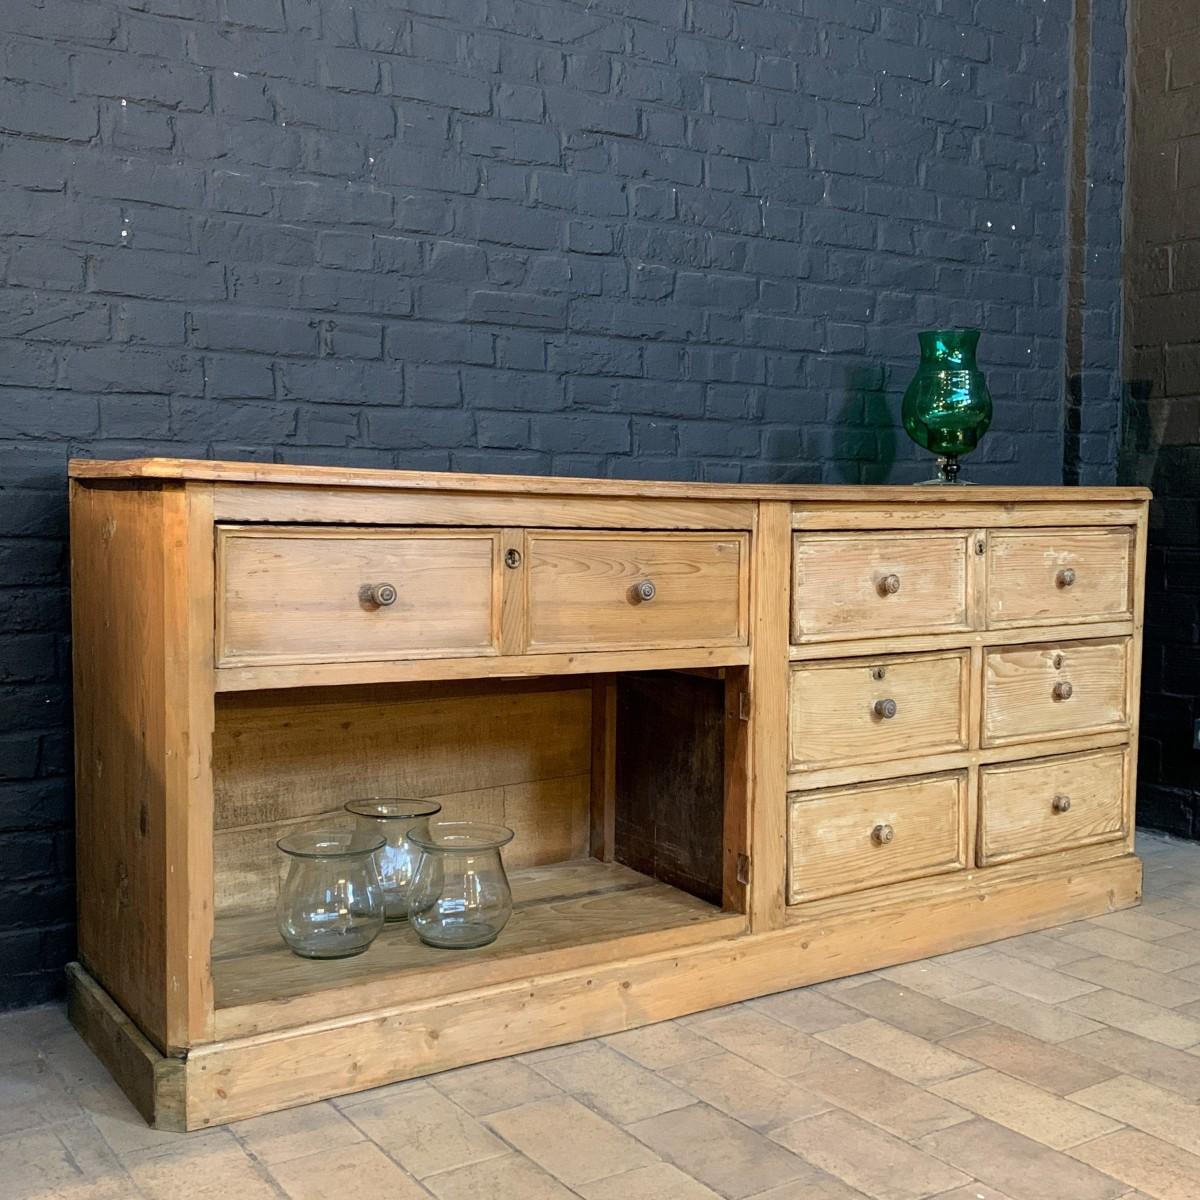 Wooden worshop cabinet